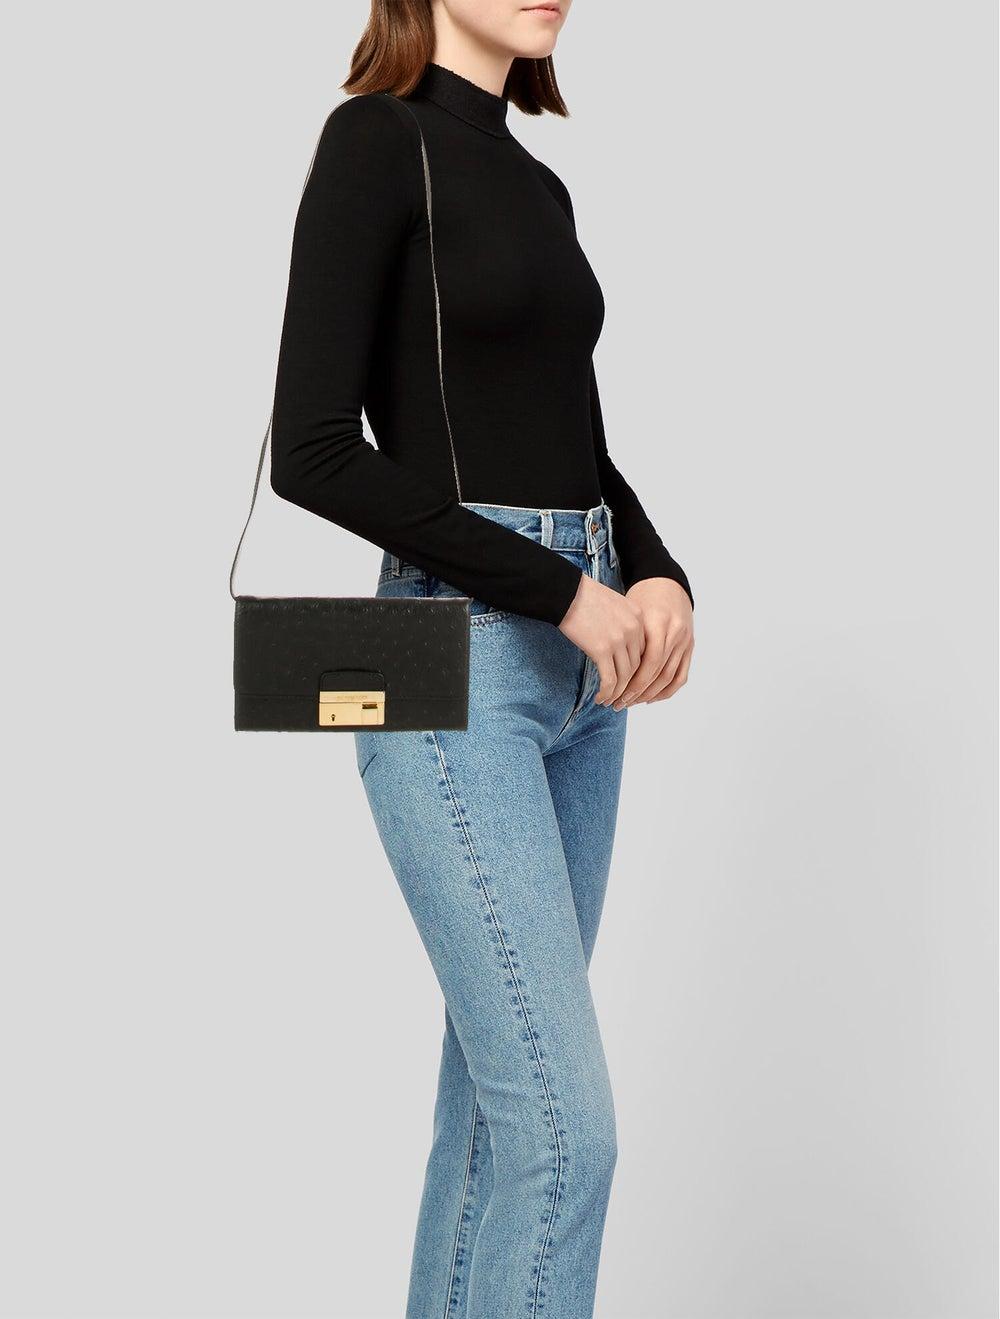 Michael Kors Embossed Leather Bag Black - image 2